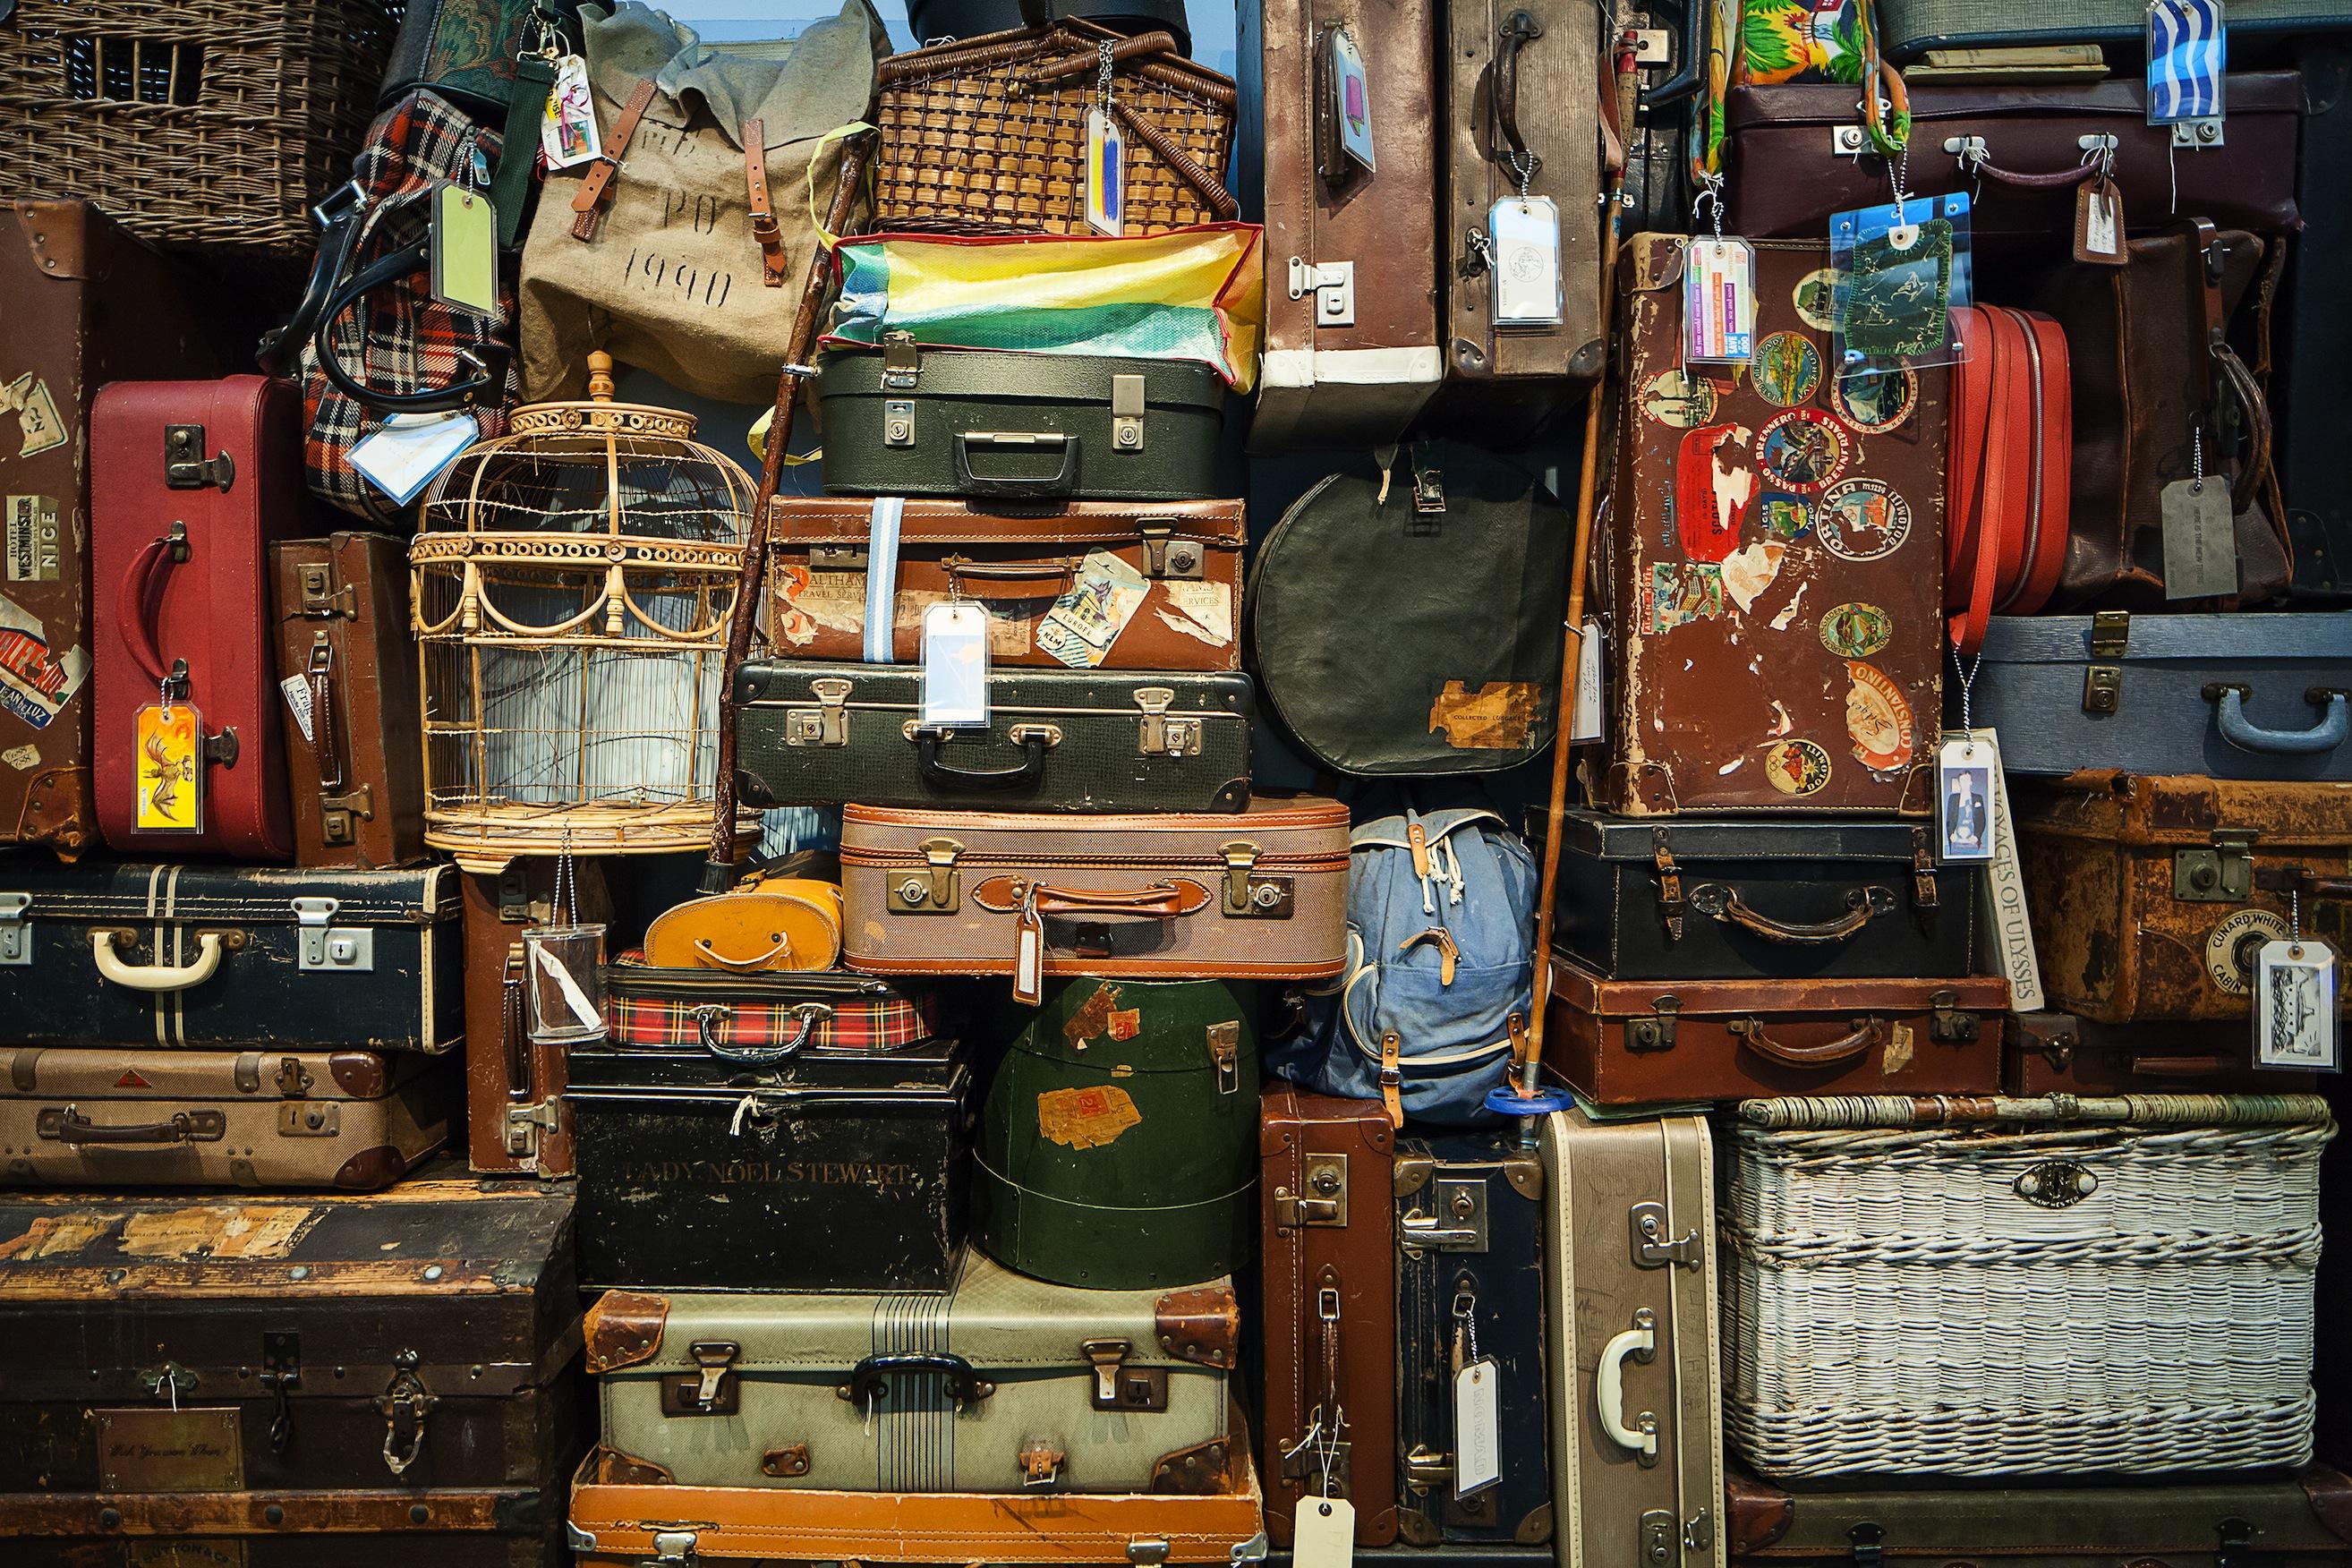 Stacks of luggage.